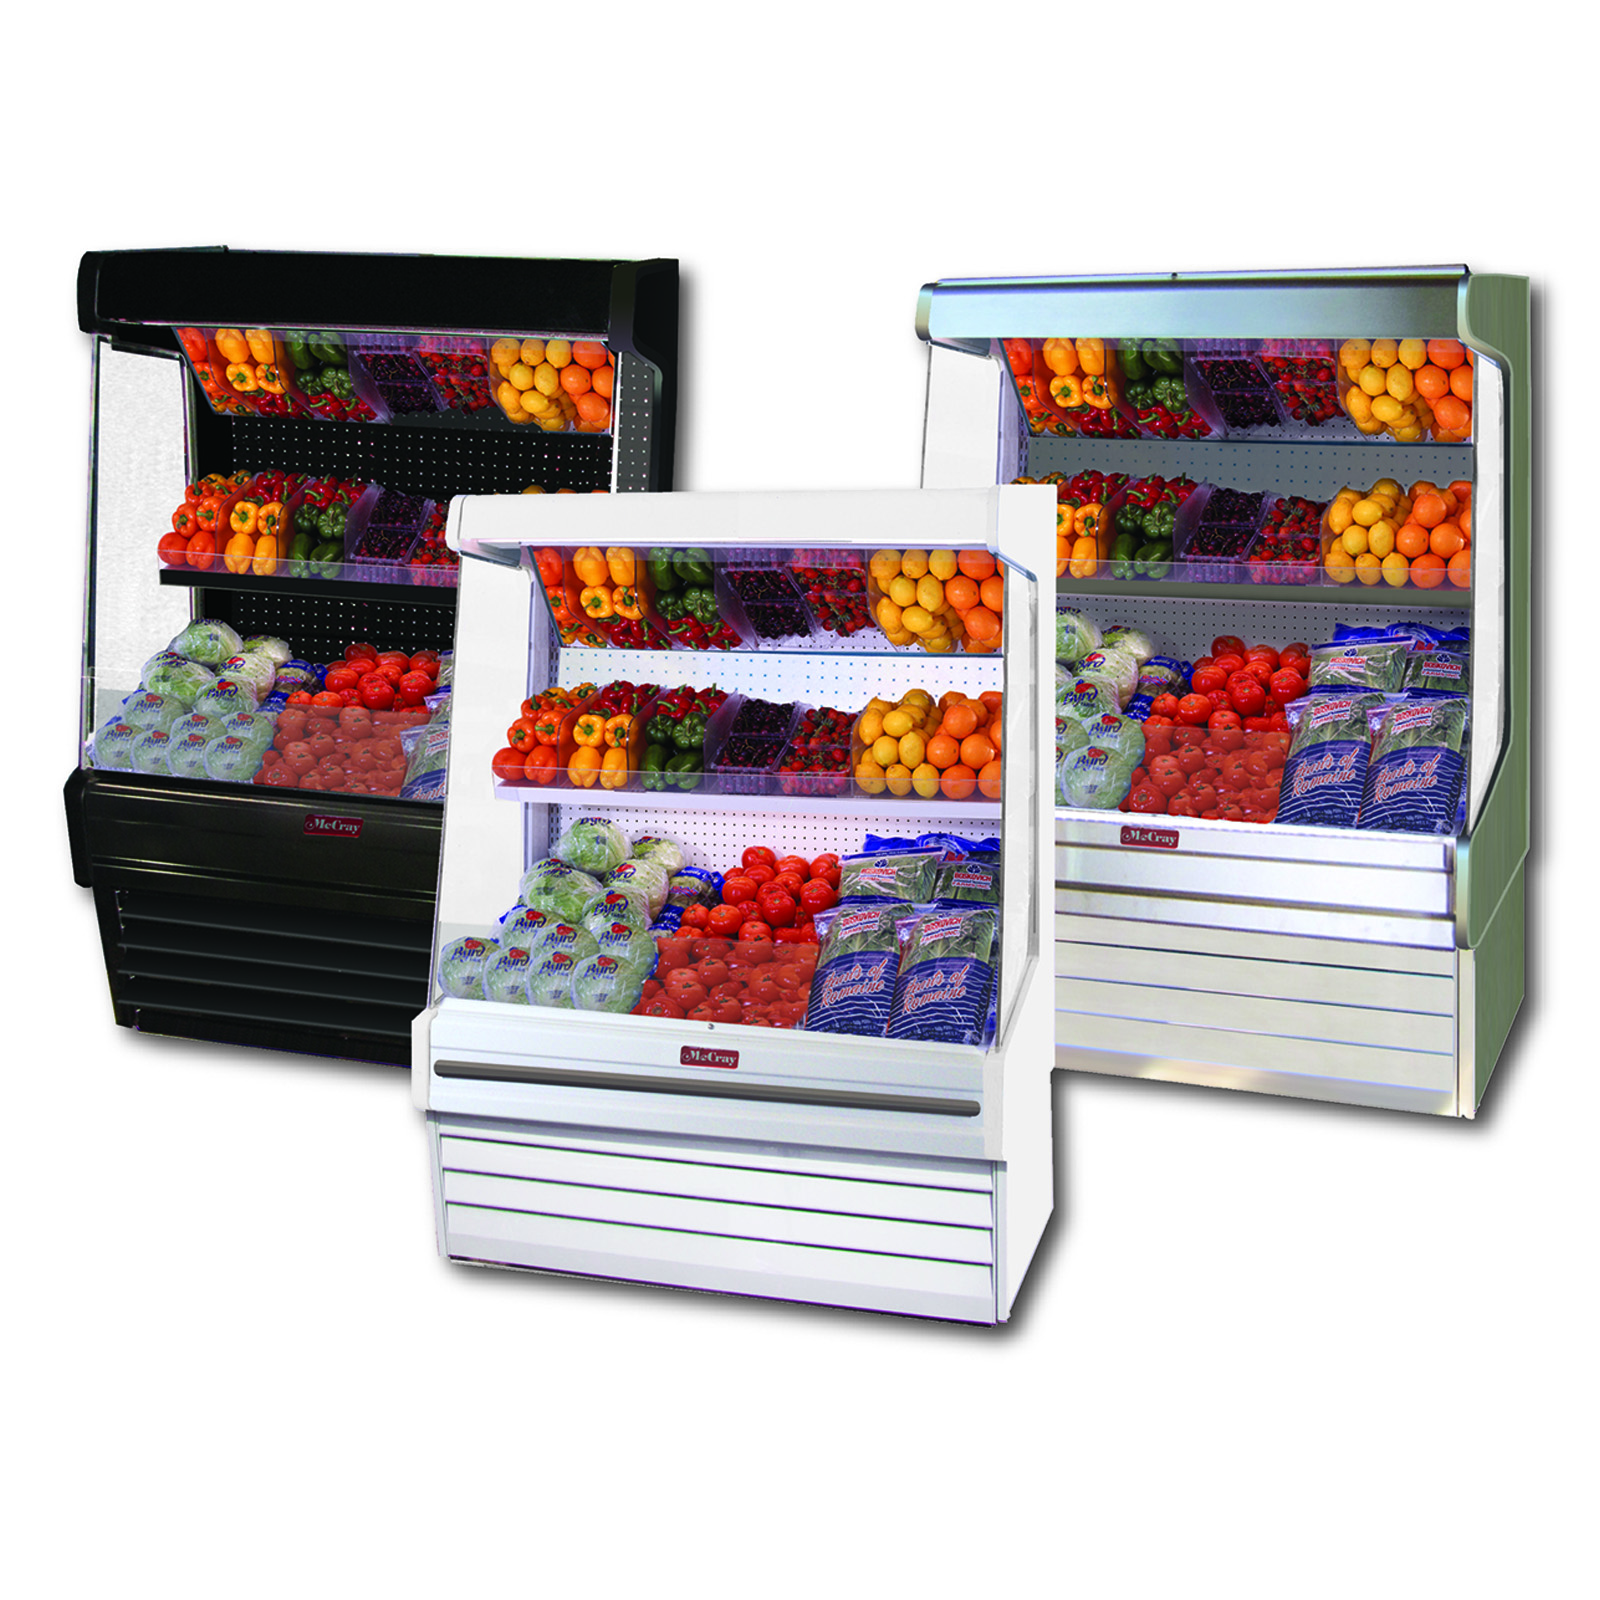 Howard-McCray R-OP30E-10-LED display case, produce